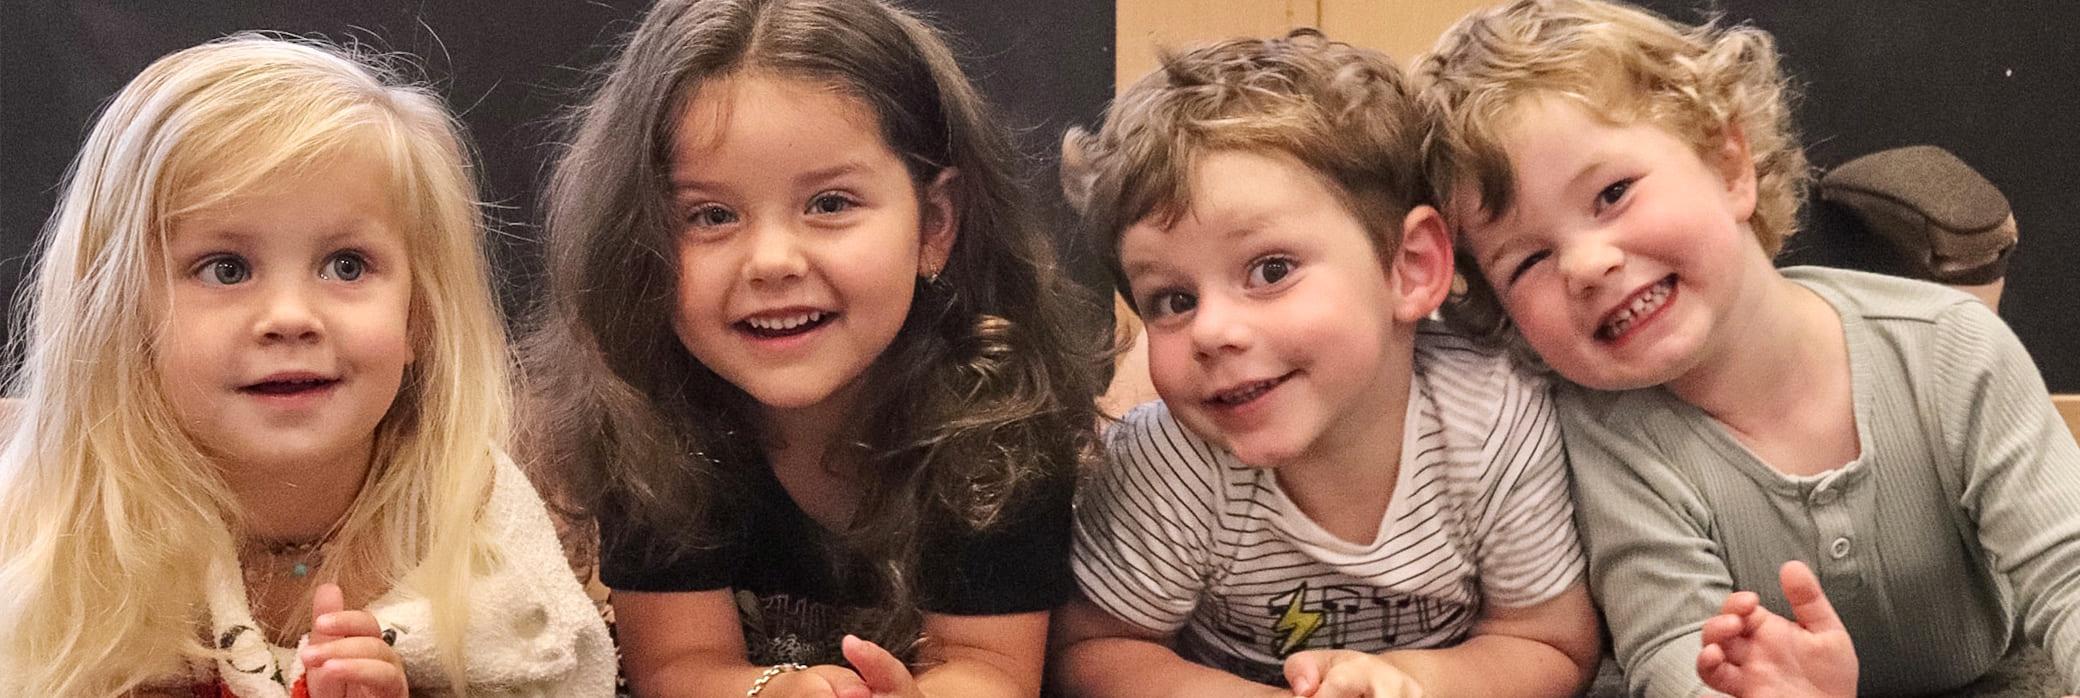 Kinderdagverblijf de Bron in Ridderkerk